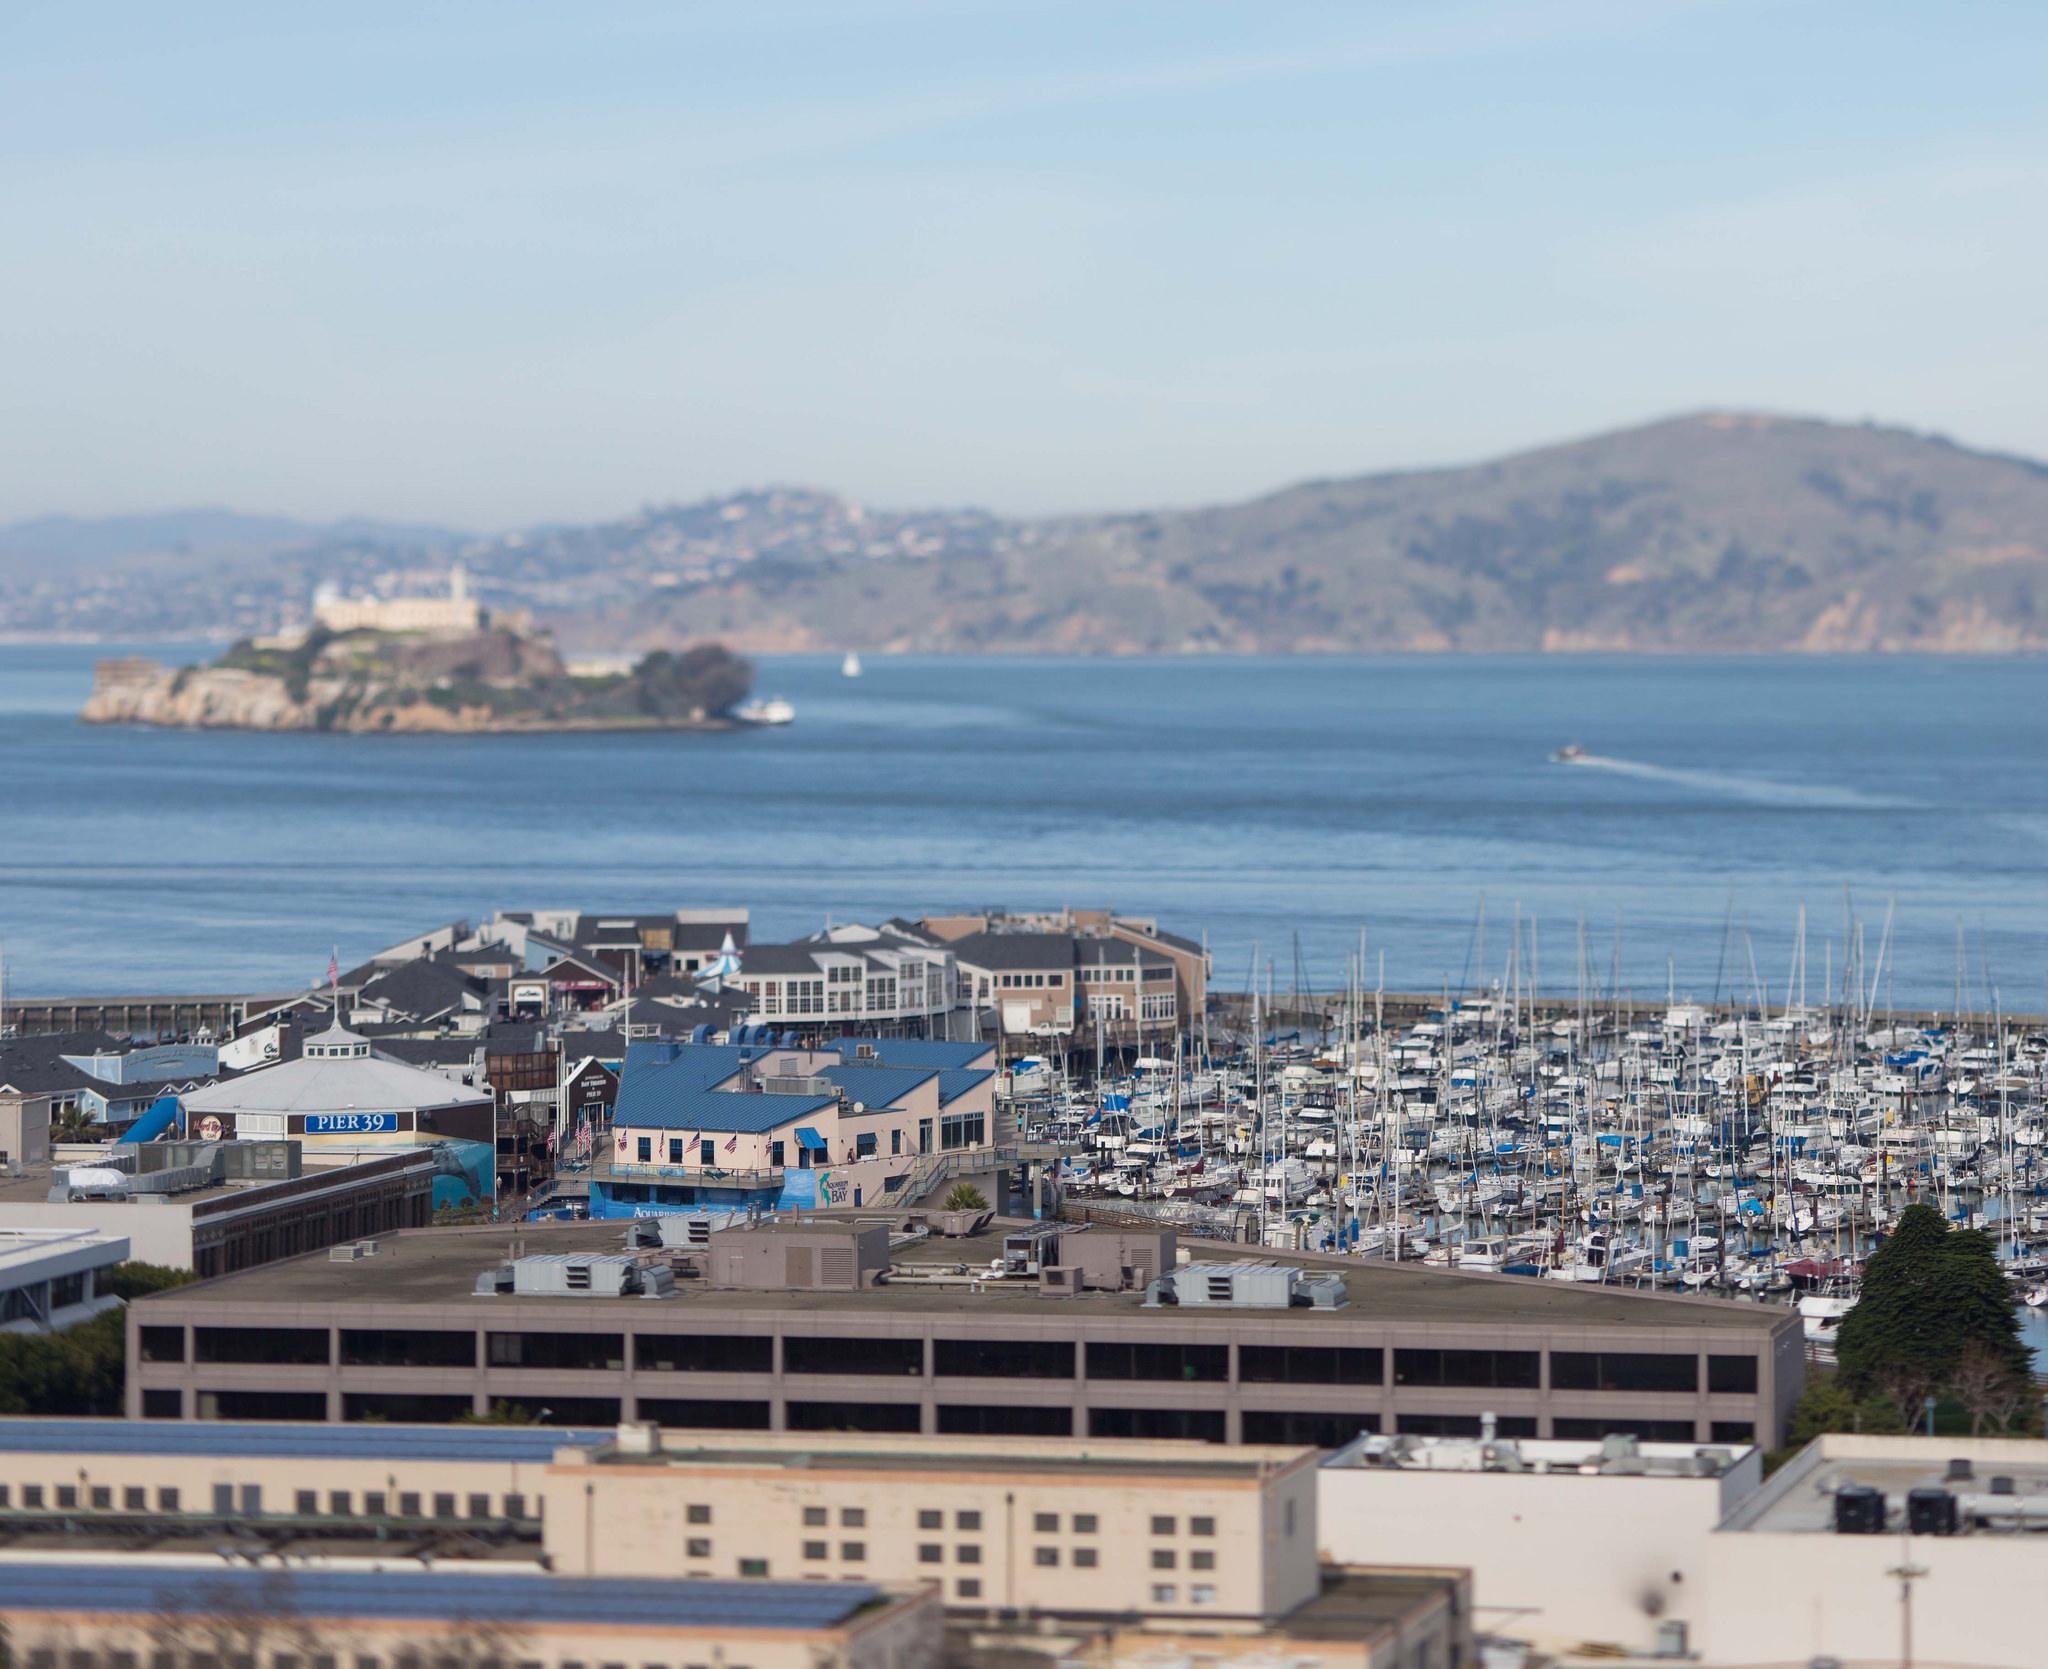 Pier 39, Alcatraz in background